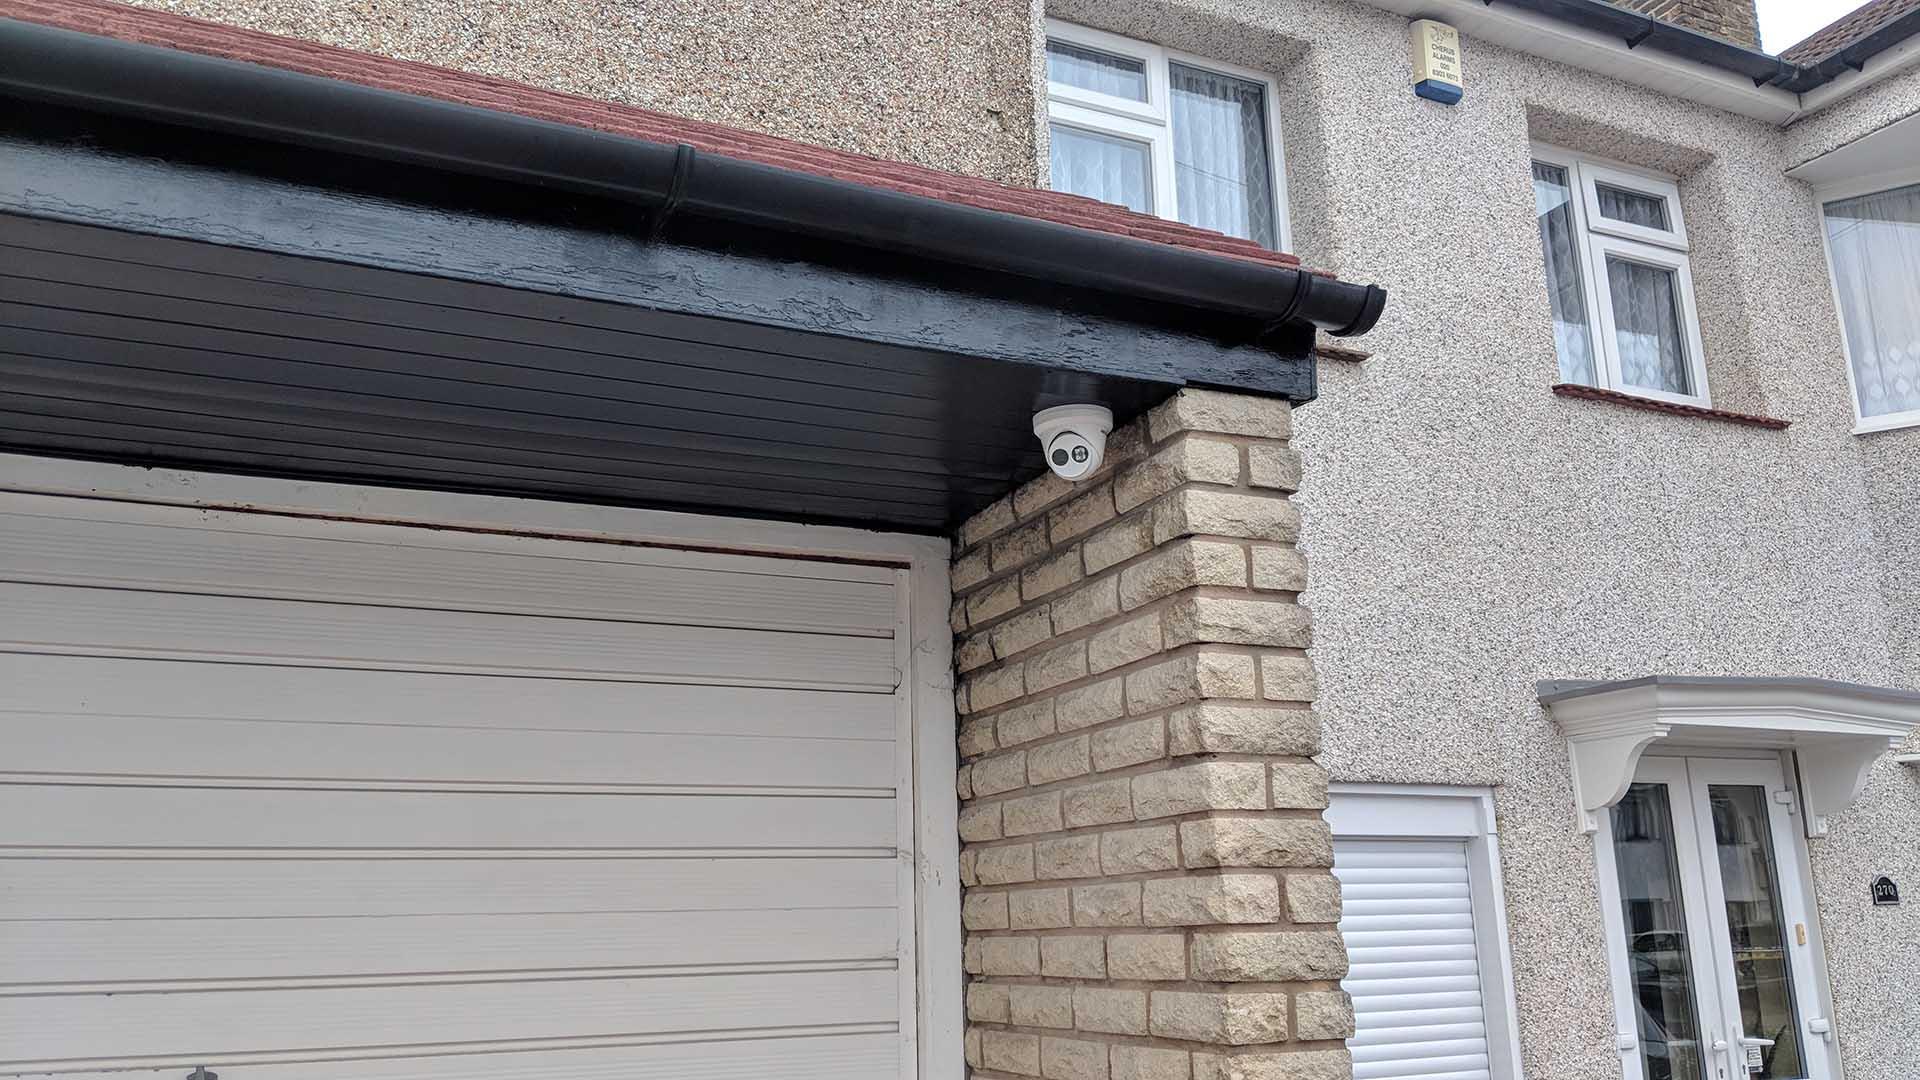 4K CCTV Installation in Welling